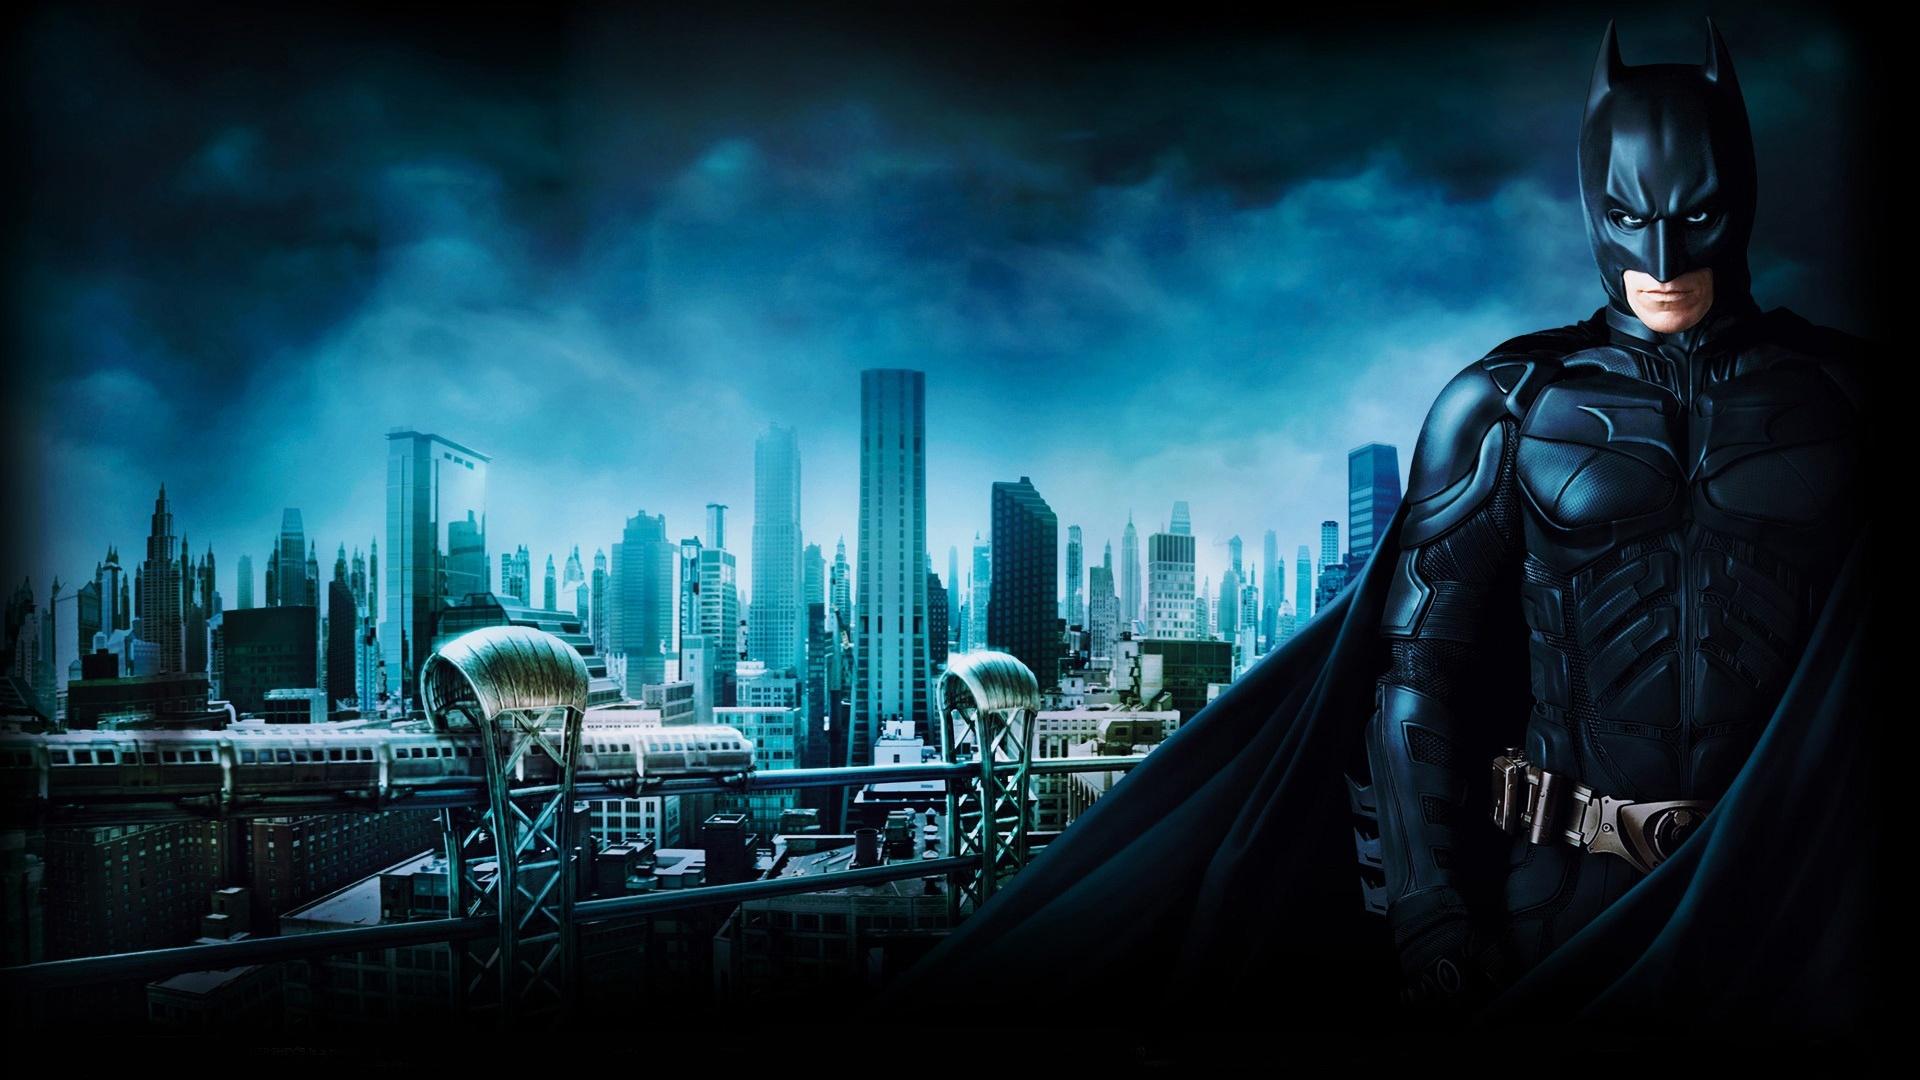 Batman 3 Wallpaper HD Widescreen Movie Desktop Celebrity and Movie 1920x1080